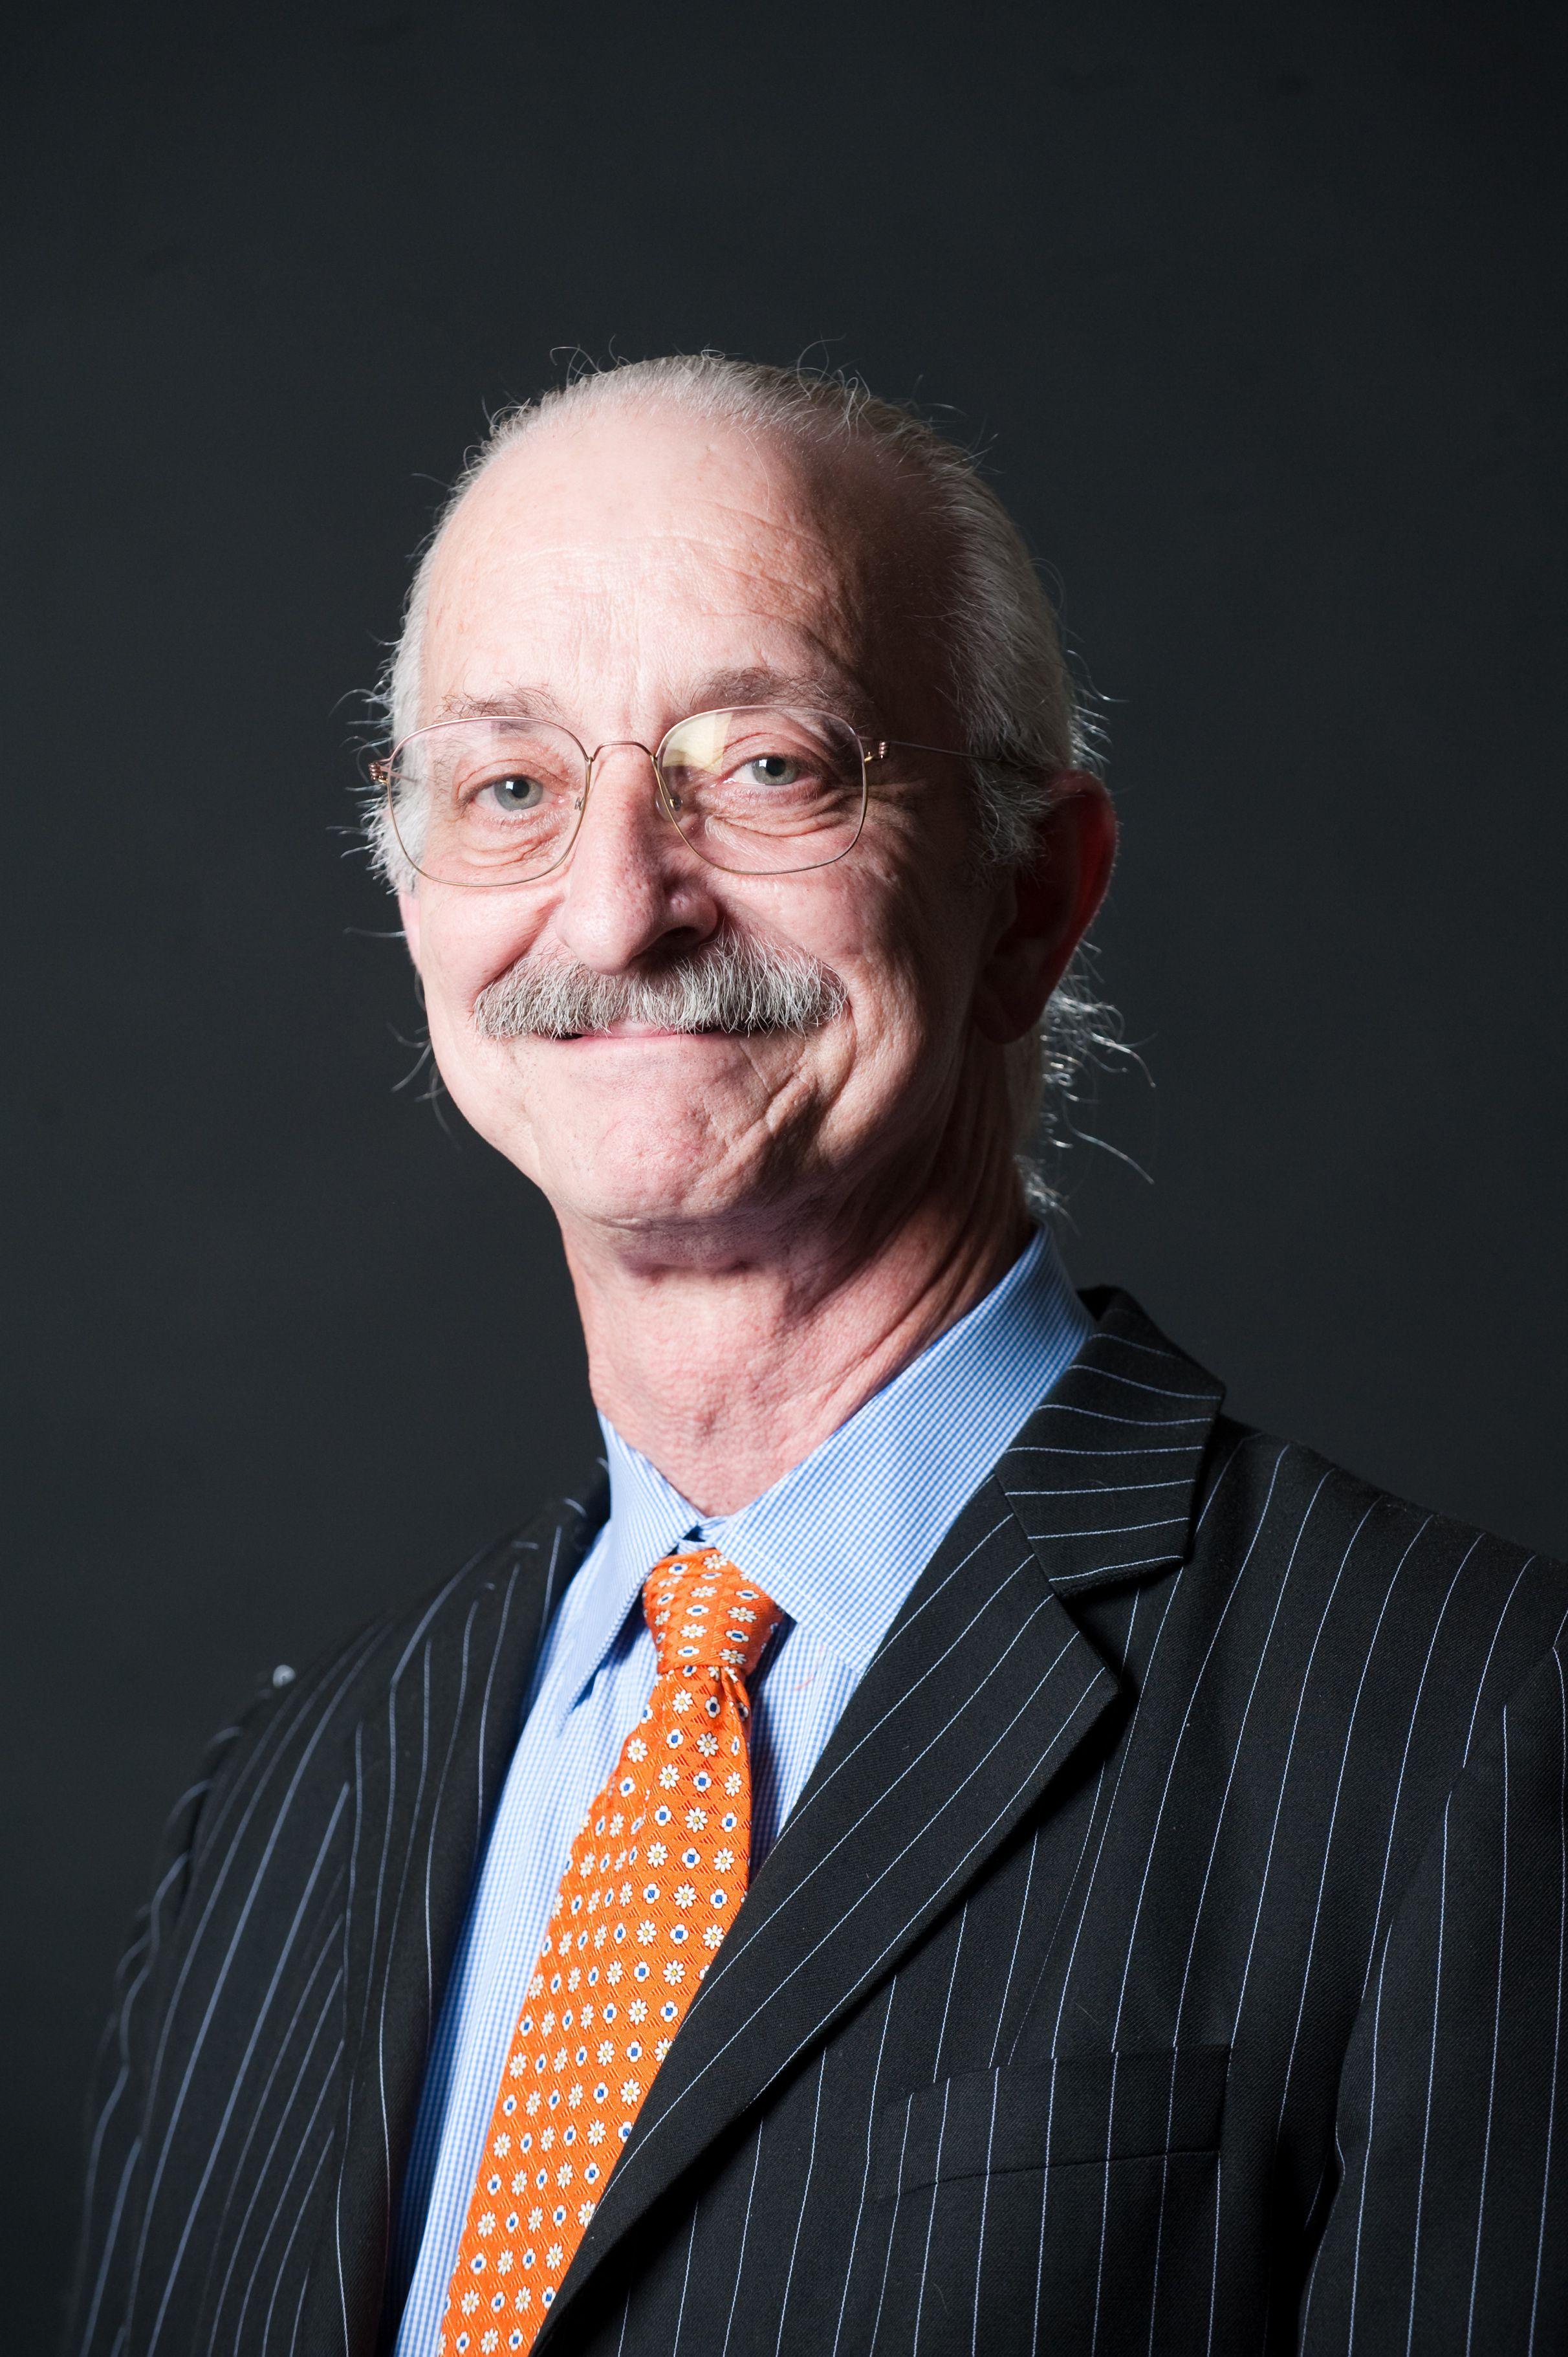 Professor Emeritus Woodie Flowers Innovator In Design And Engineering Education Dies At 75 Mit News Massachusetts Institute Of Technology